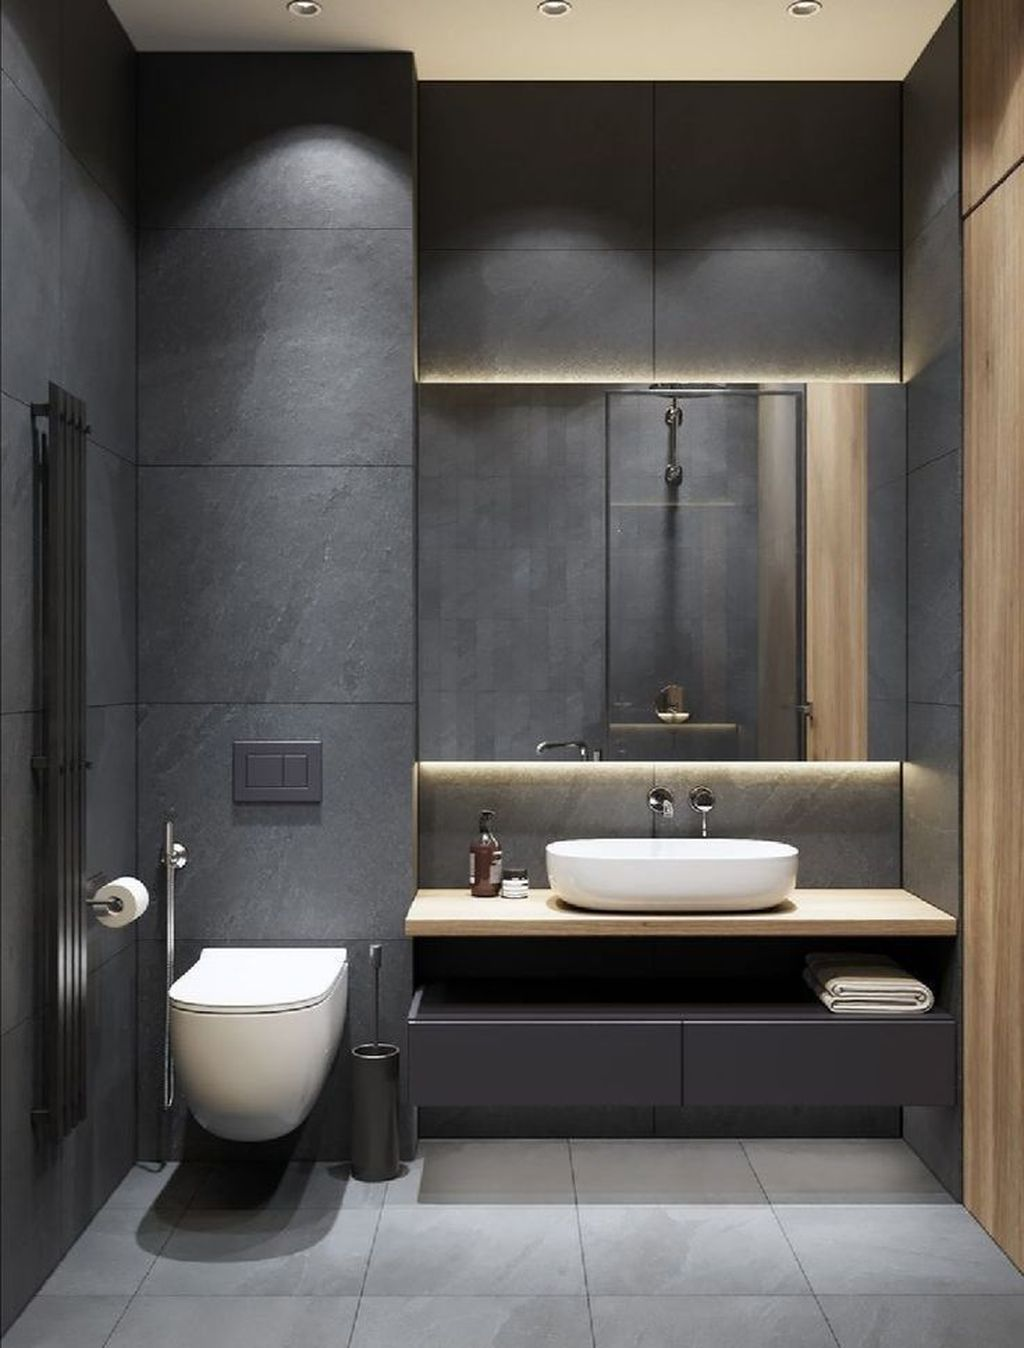 36 Nice Small Bathroom Design Ideas That You Should Copy Minimalist Bathroom Design Washroom Design Restroom Design Minimalist luxury small bathroom